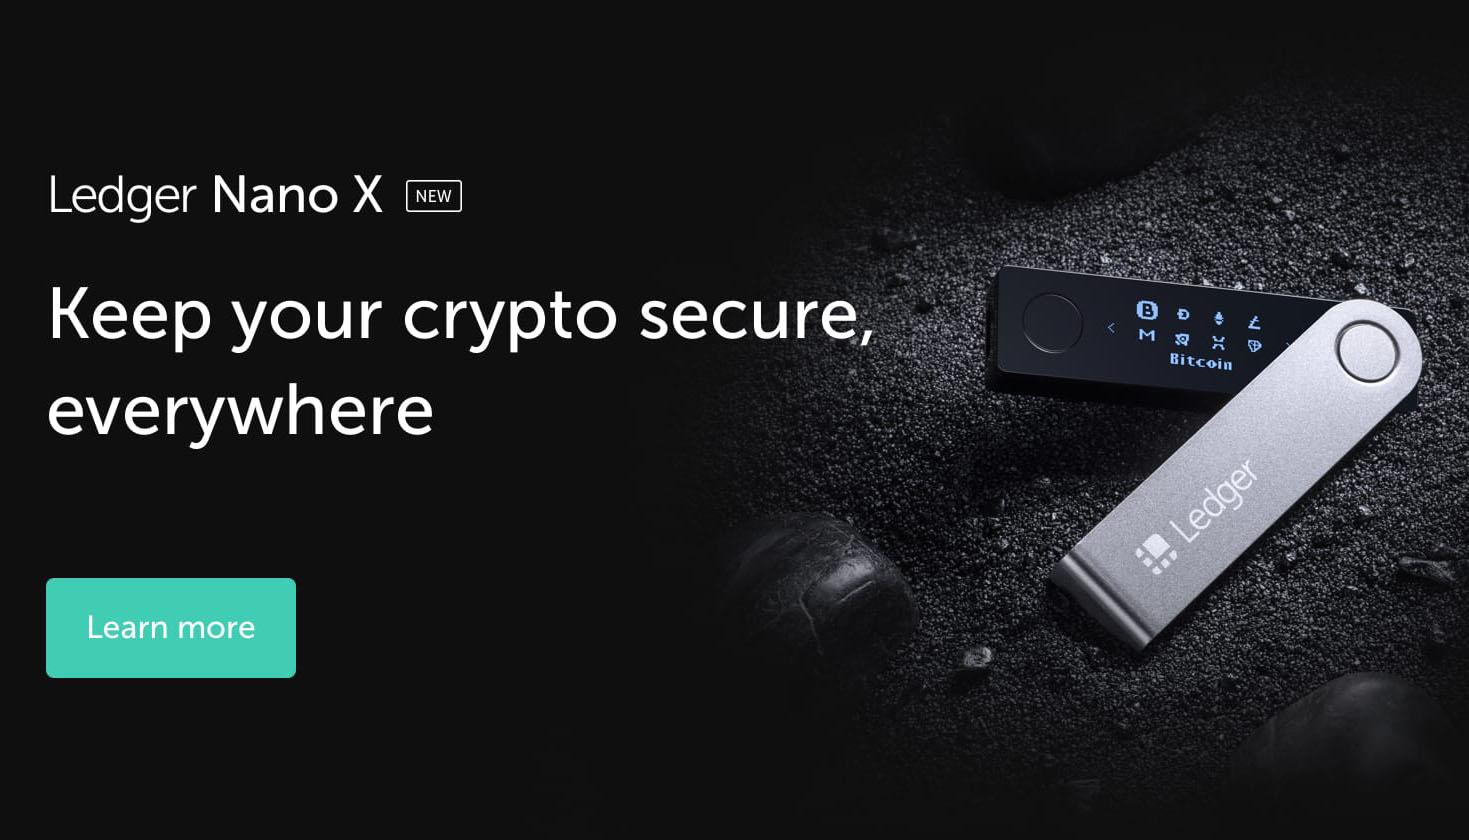 Hardware-lompakot Ledger Nano S ja Nano X